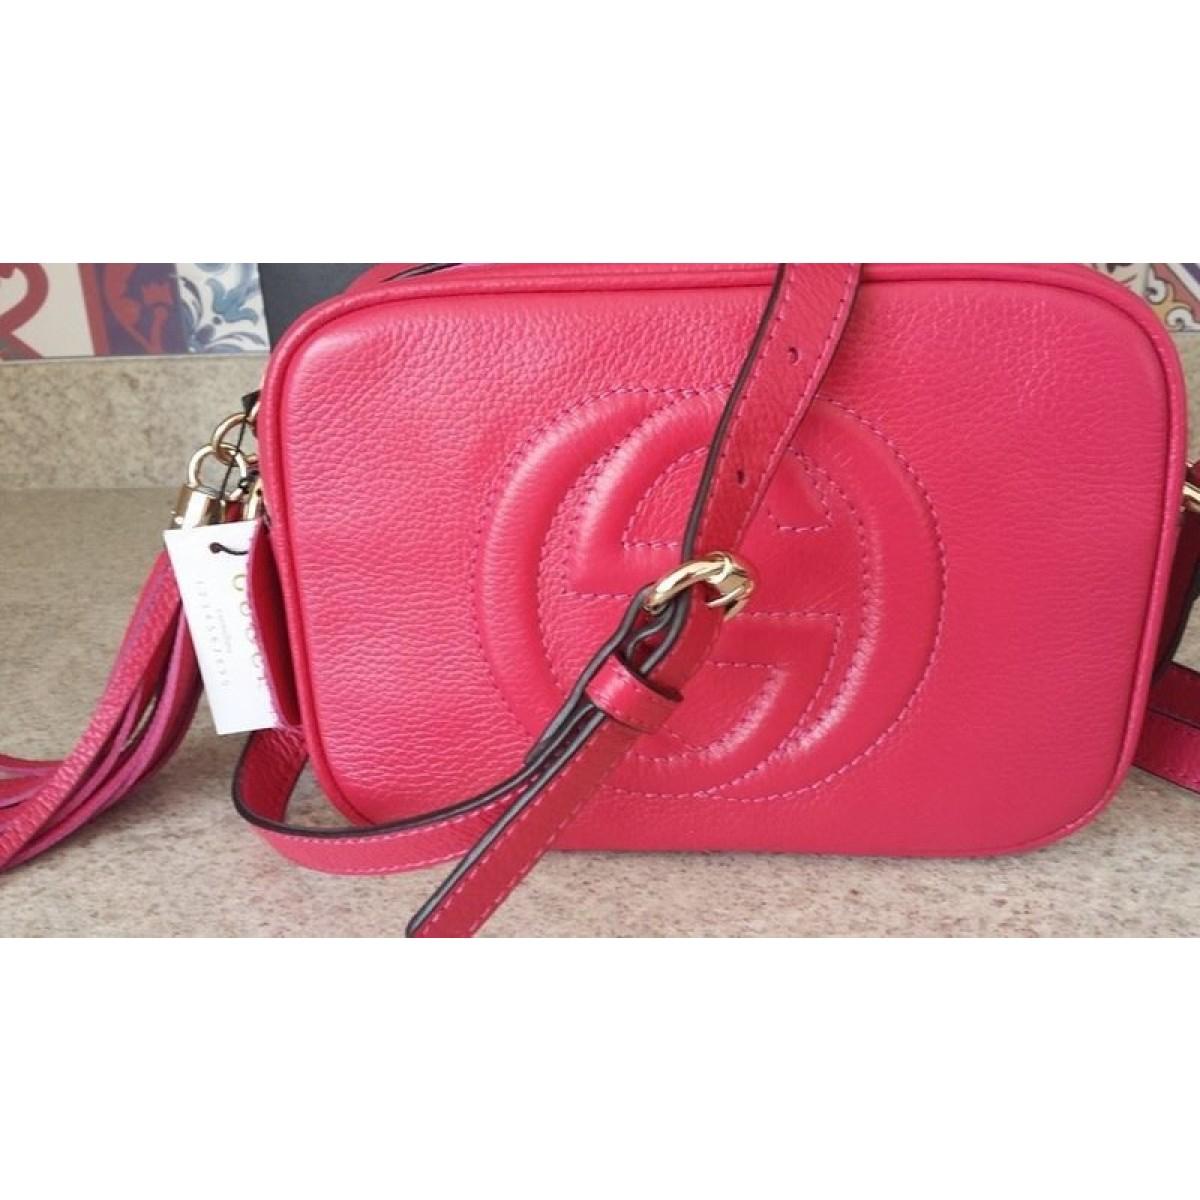 Bolsa Gucci Pequena Inspired : R?plica de bolsa gucci soho disco pink